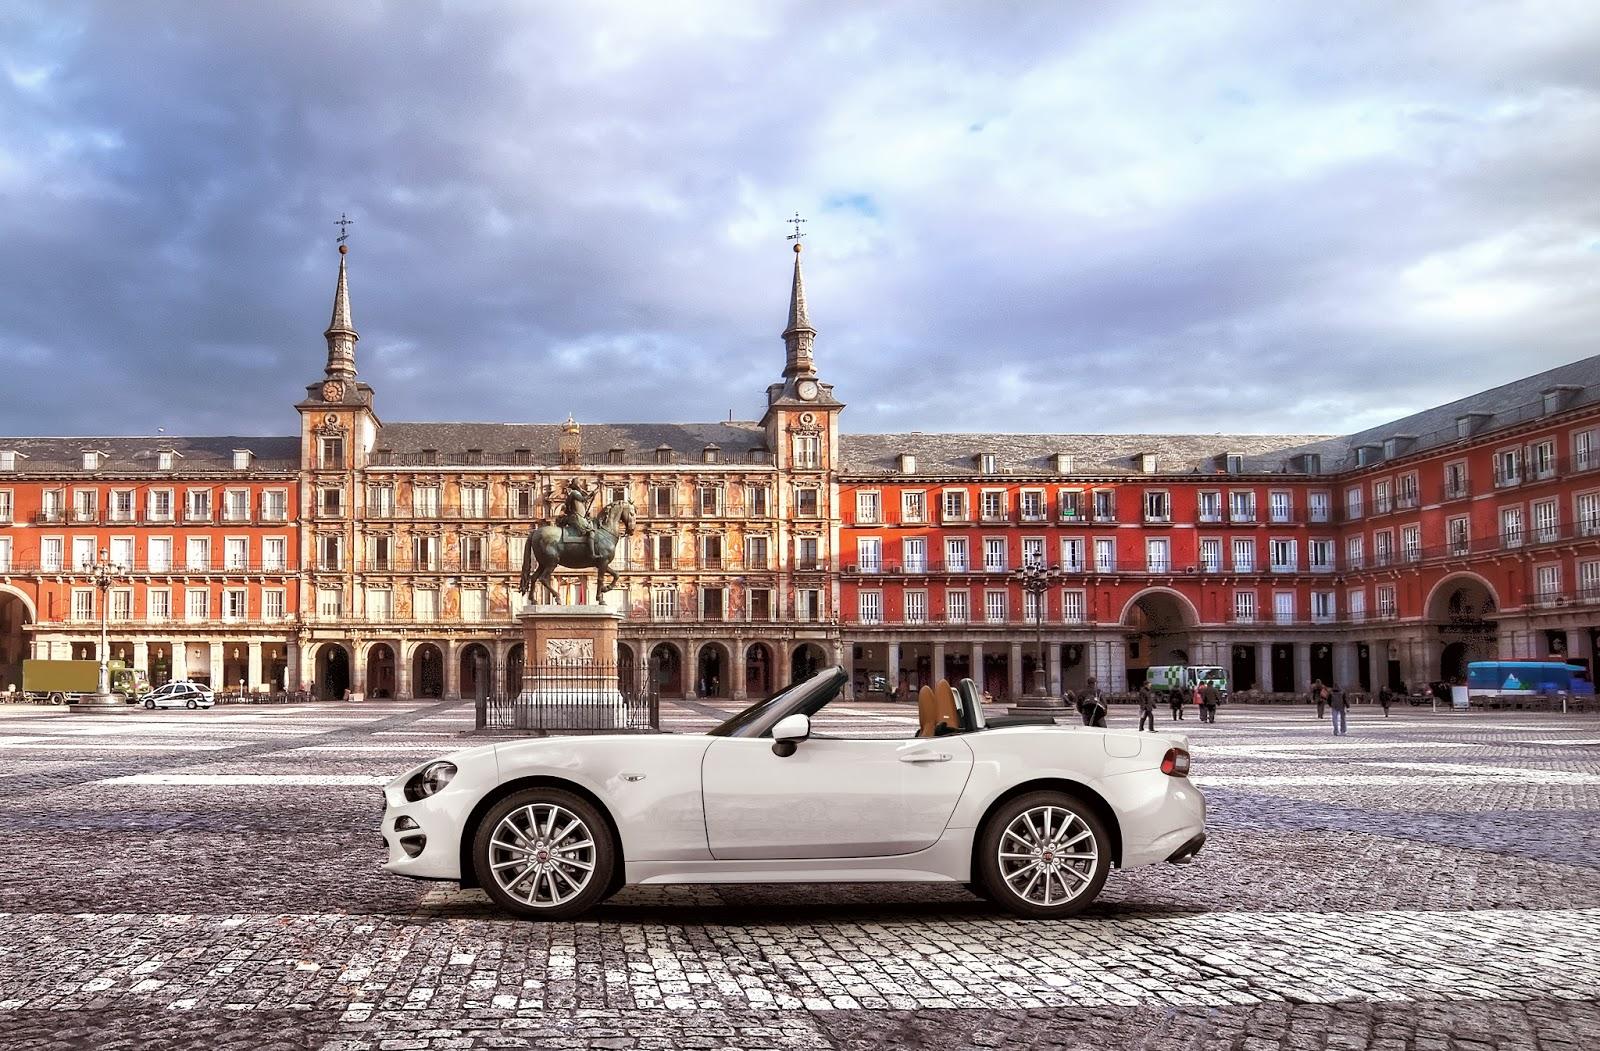 MADRID capotte%2Baperta Το Fiat 124 Spider άρχισε τις εξορμήσεις